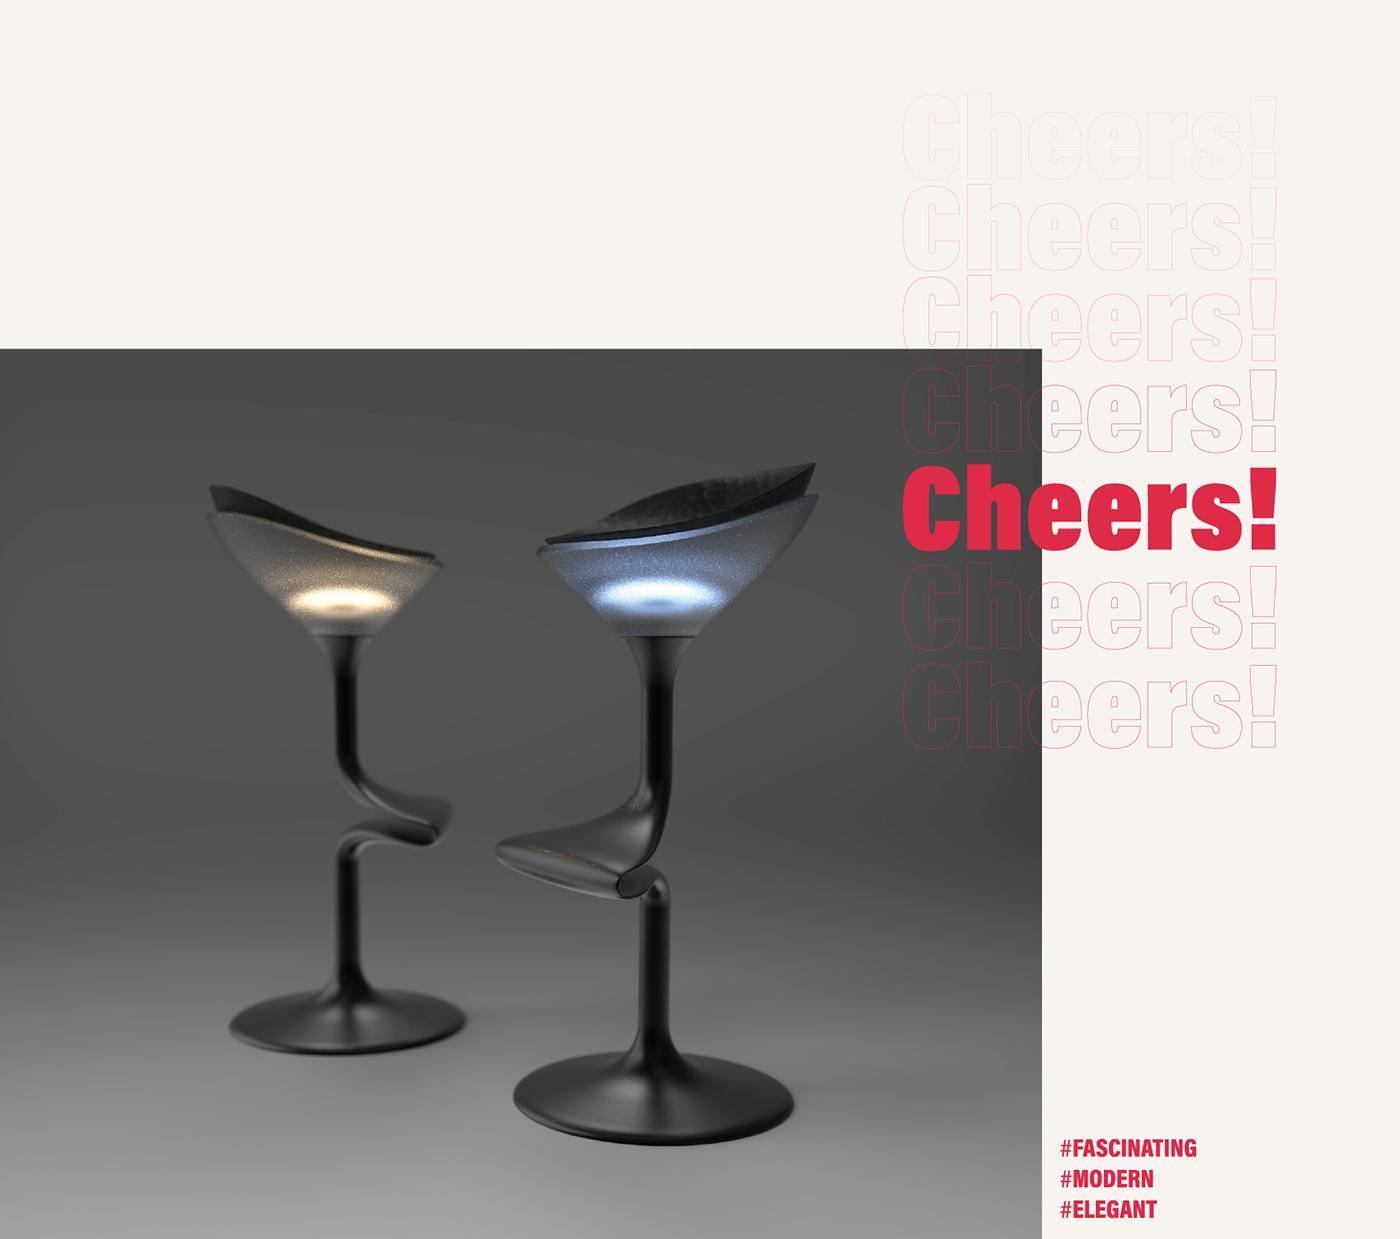 bar chair cocktail drink firniture glass height highstool stool wine